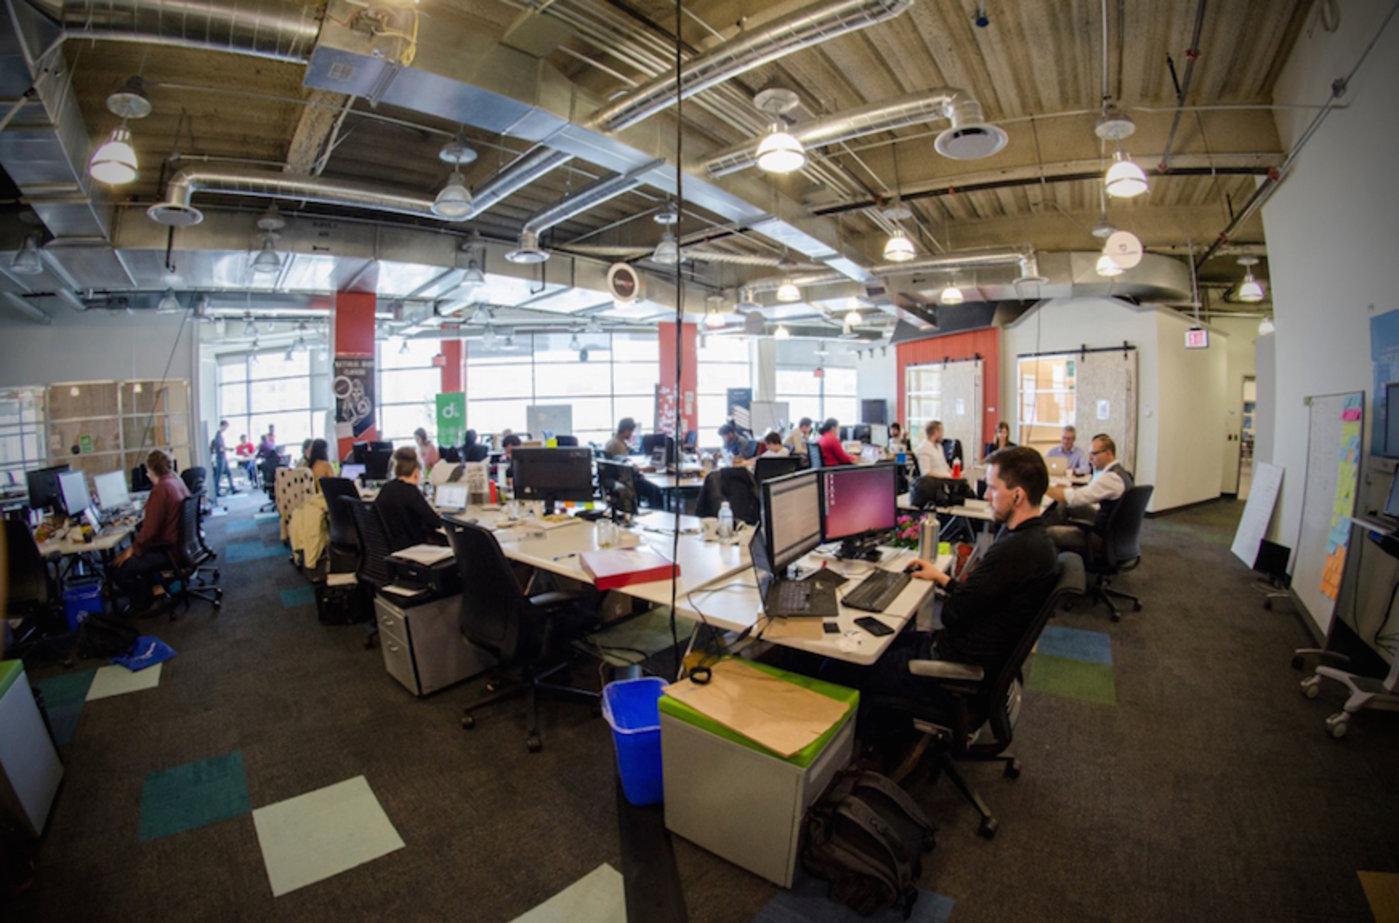 bluemix garage是IBM推出的一种致力于让开发人员和企业使用在云端的IBM区块链代码